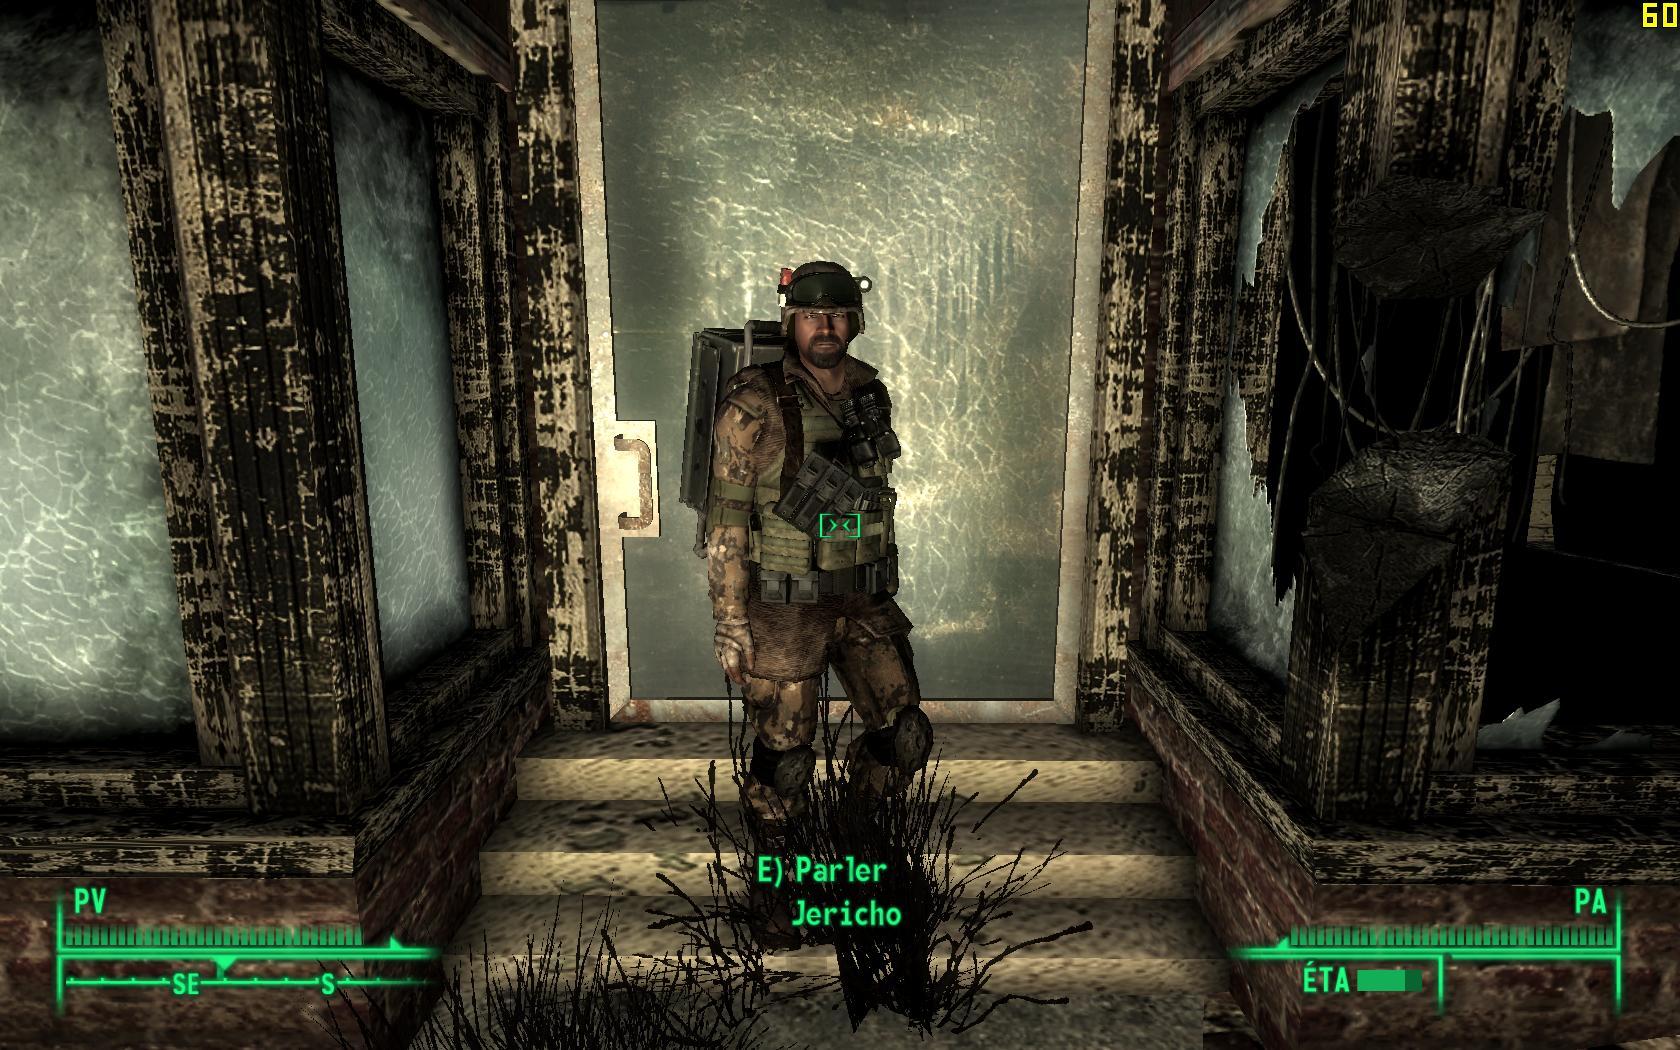 [50+] Fallout 4 Desktop Wallpaper on WallpaperSafari